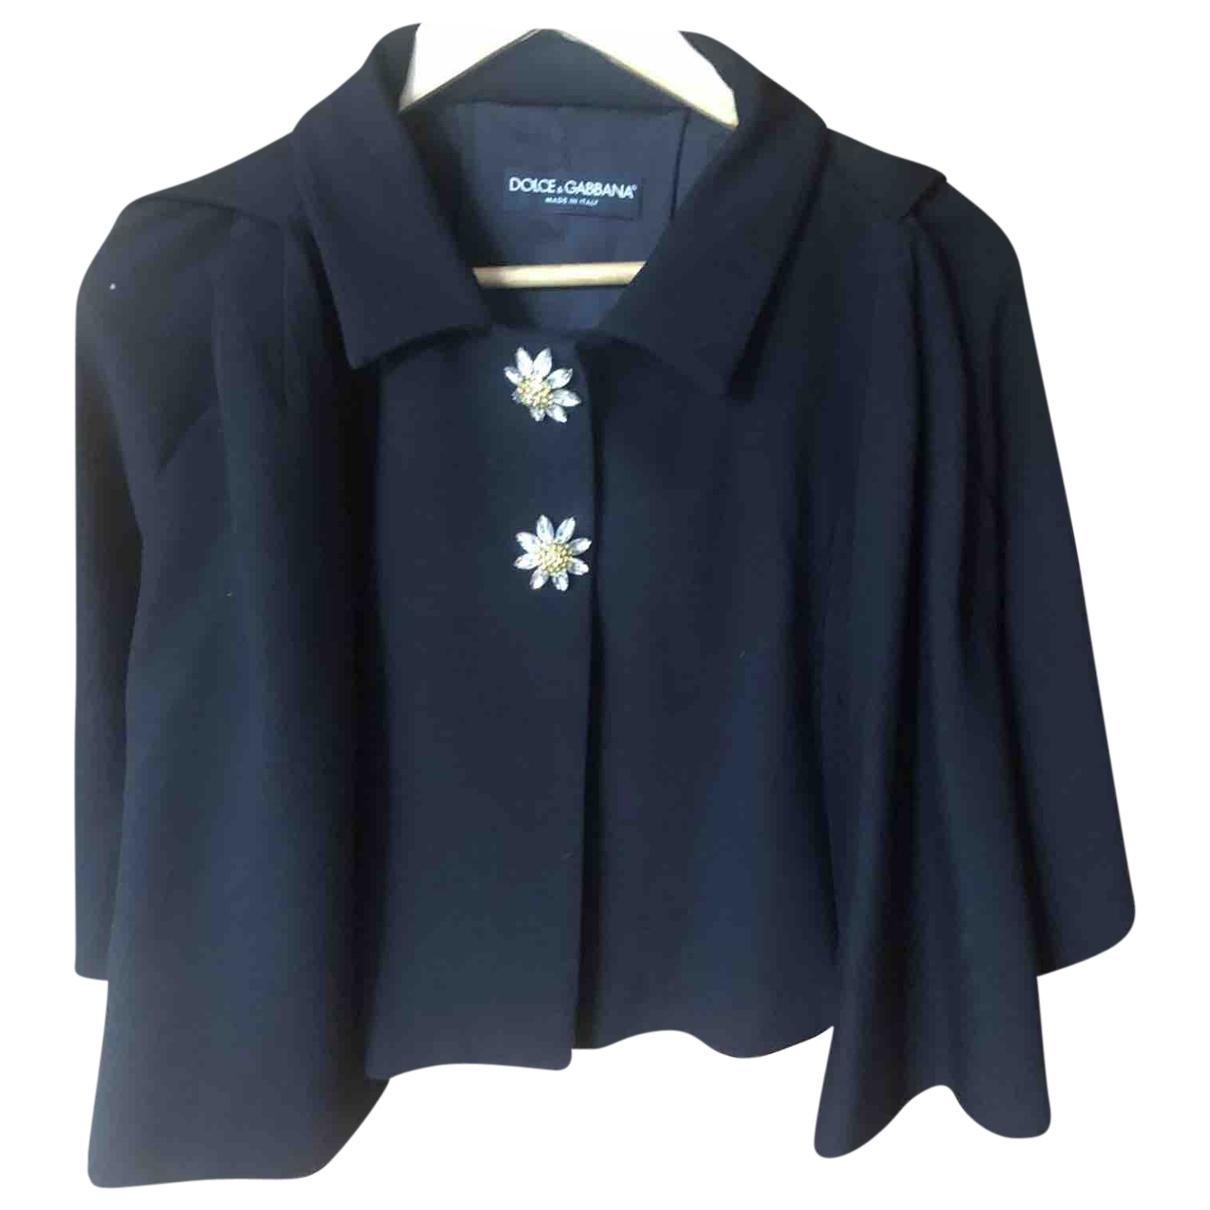 Dolce & Gabbana \N Black jacket for Women 36 FR